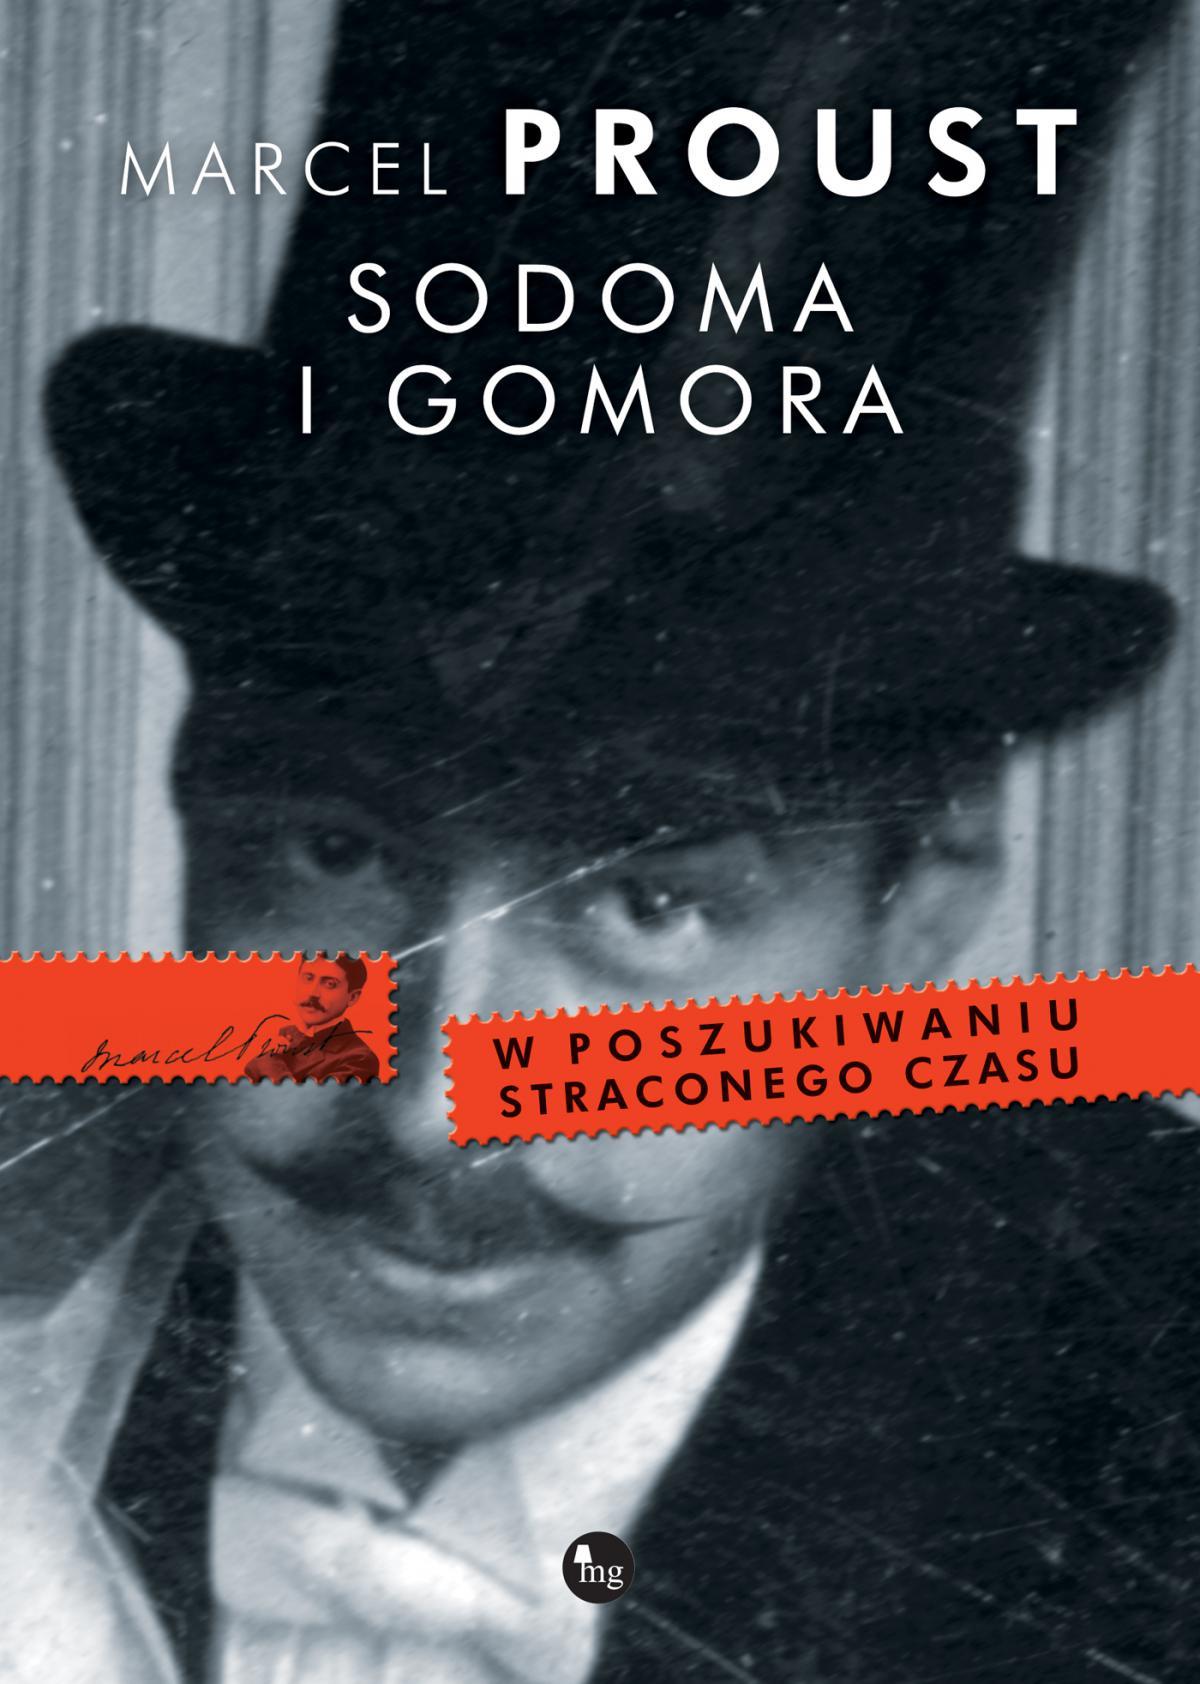 Sodoma i Gomora - Ebook (Książka na Kindle) do pobrania w formacie MOBI